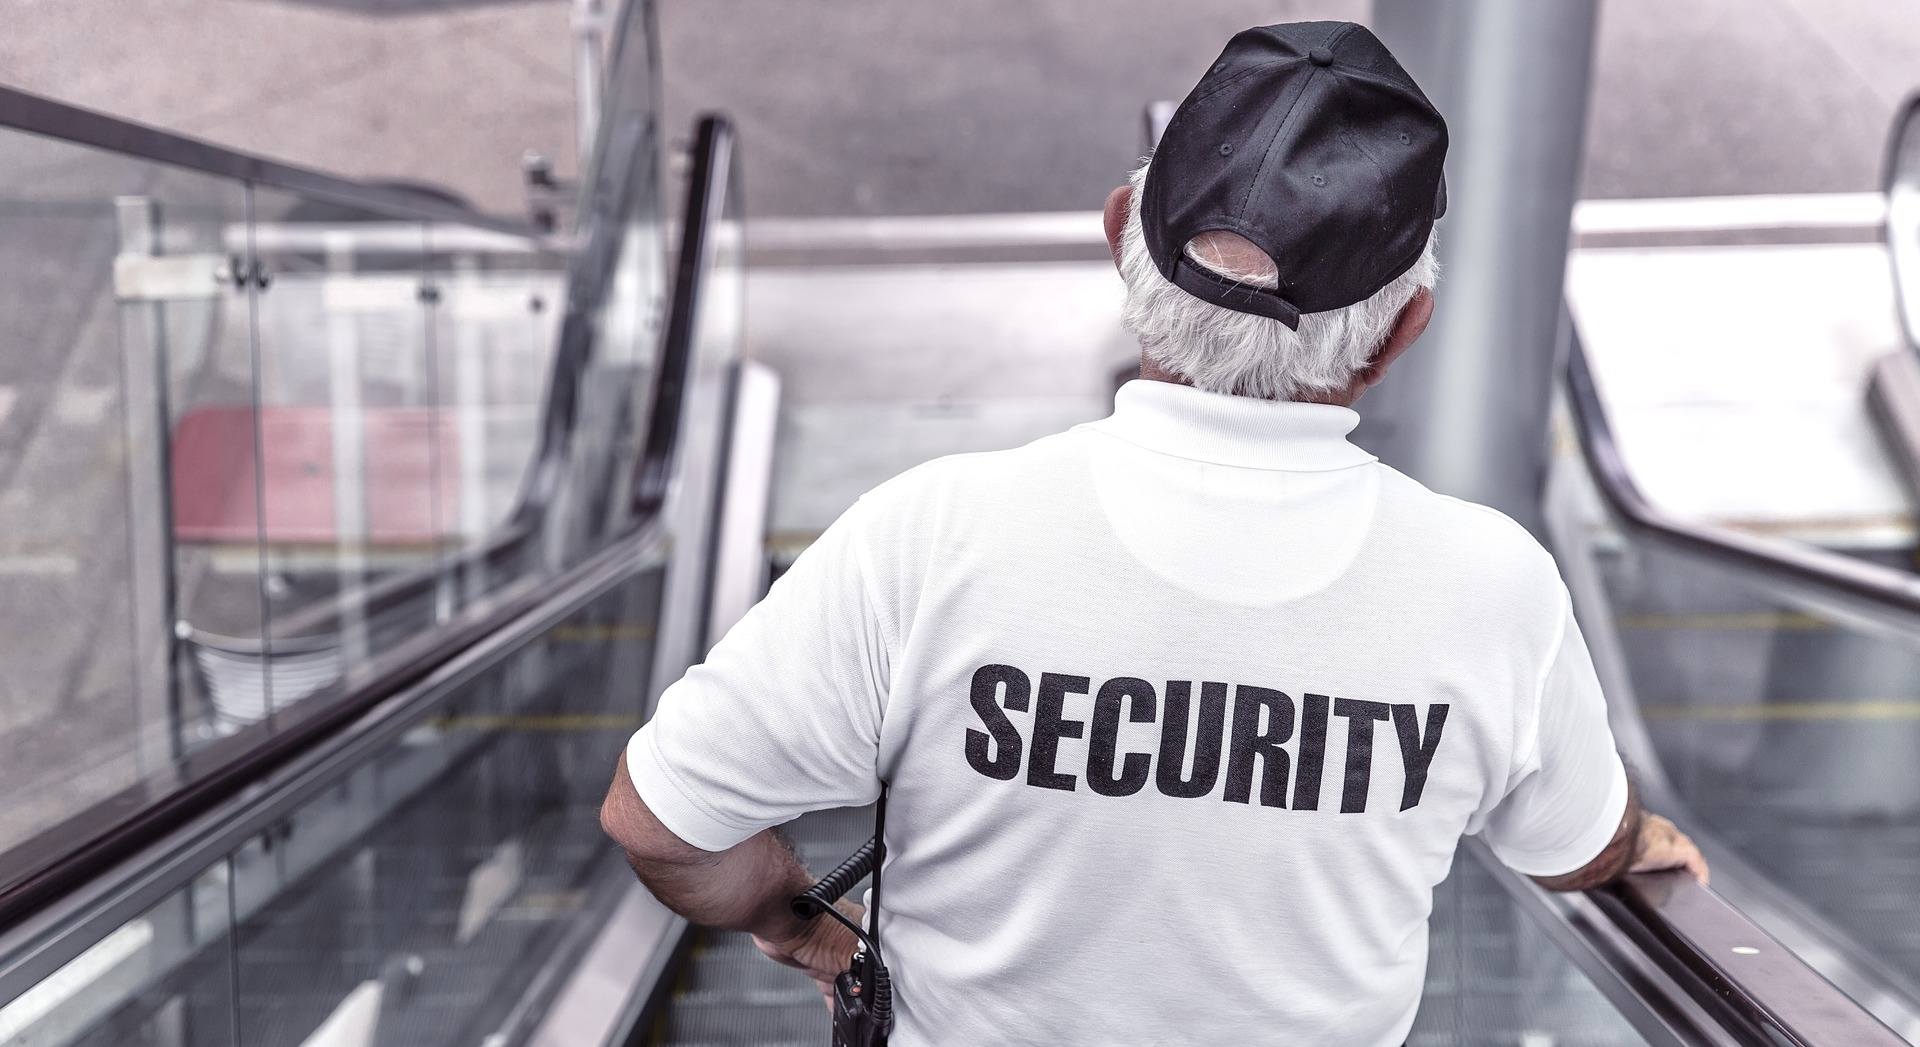 Security guard police-869216_1920 pixaba.jpg